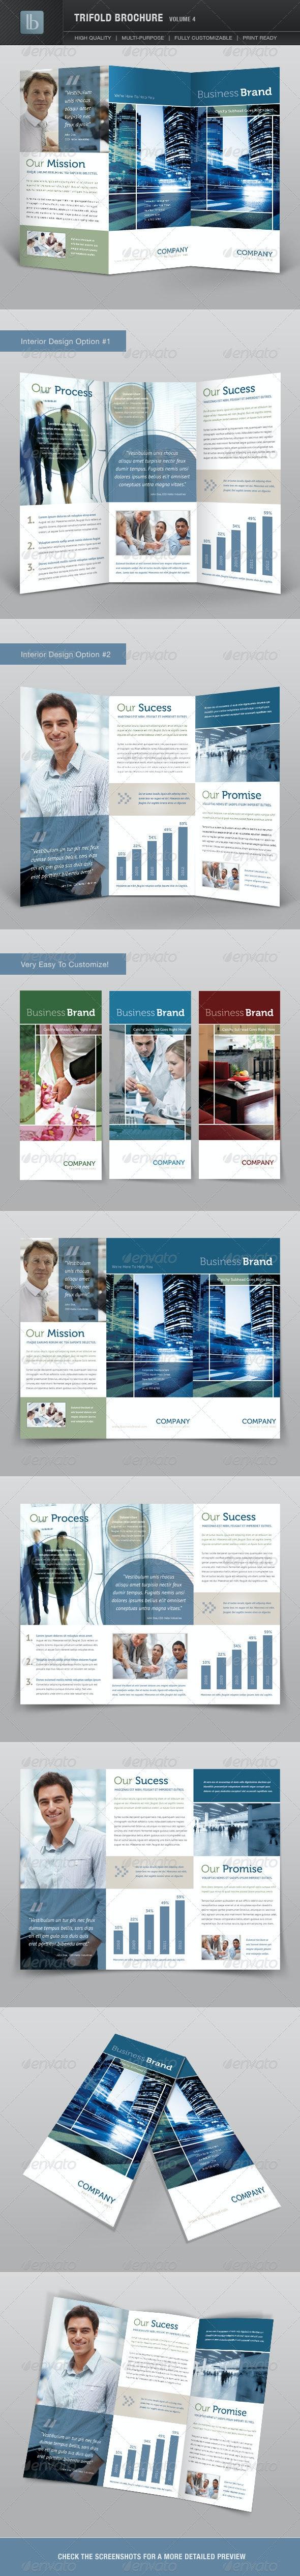 Trifold Brochure | Volume 4 - Corporate Brochures